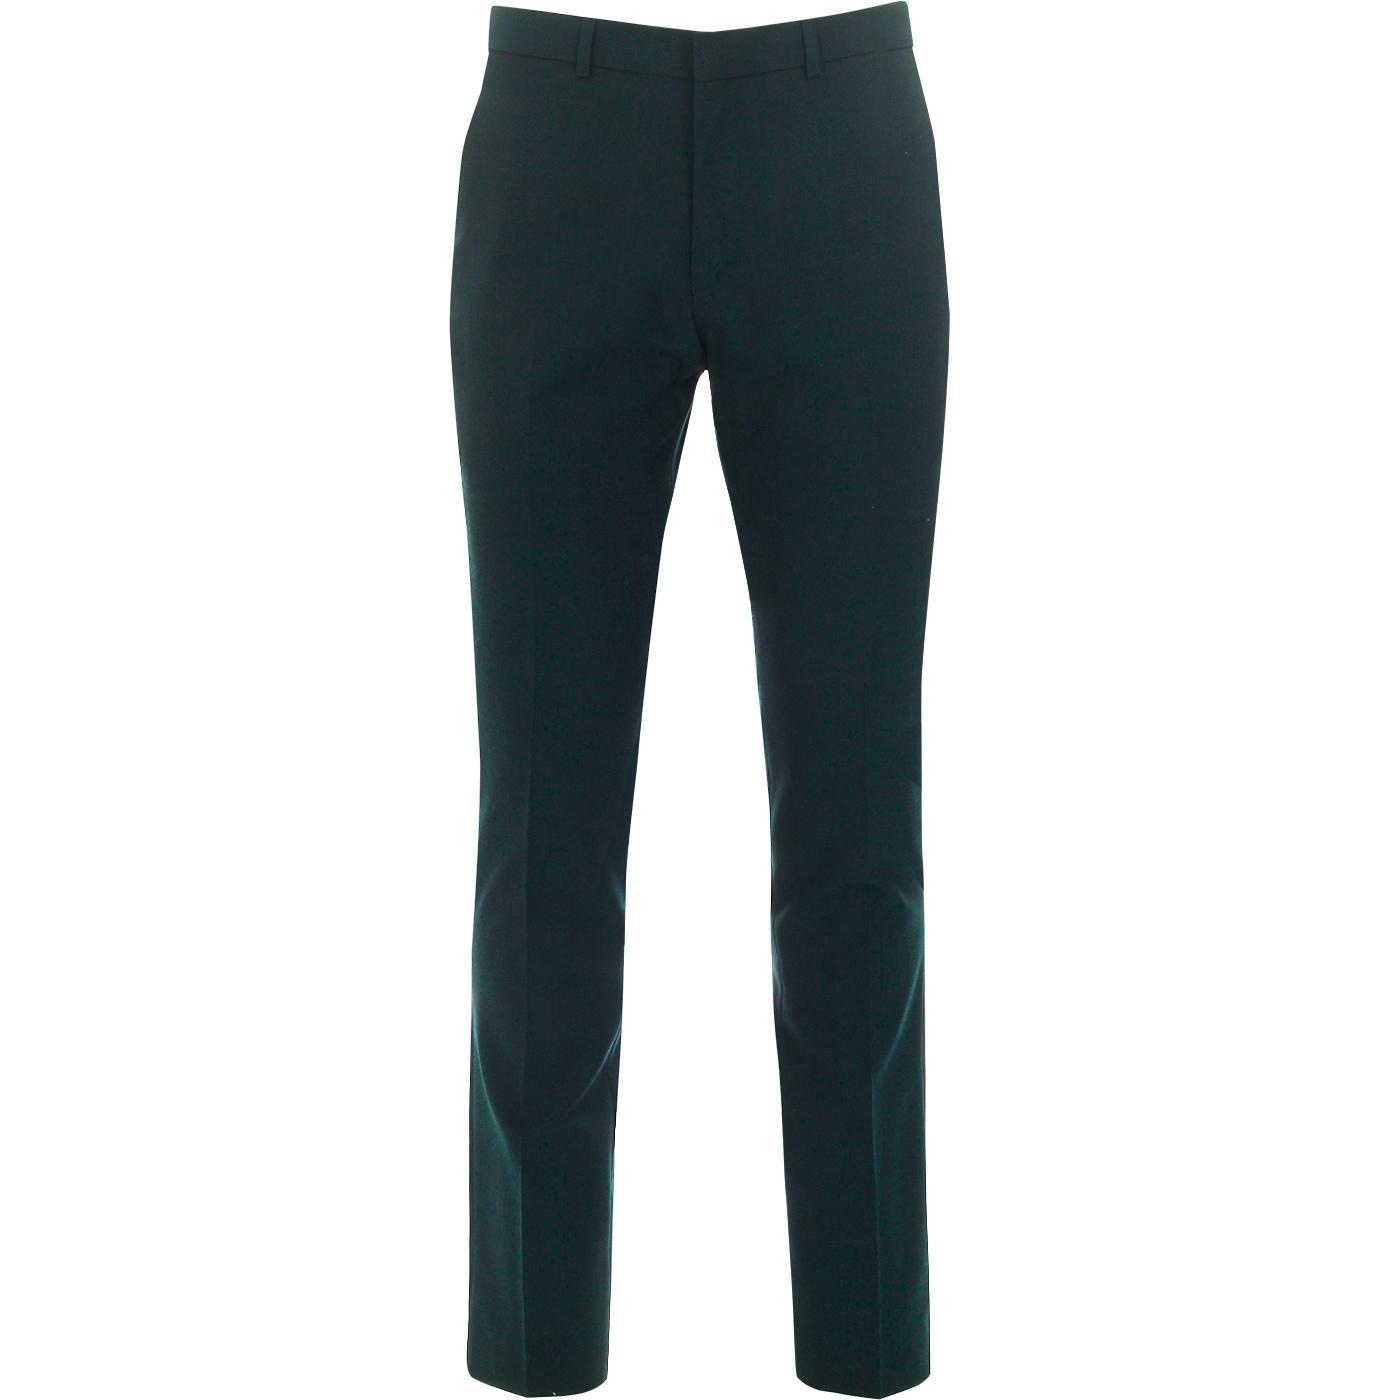 BEN SHERMAN 60s Mod Tonic Suit Trousers (Sea Moss)